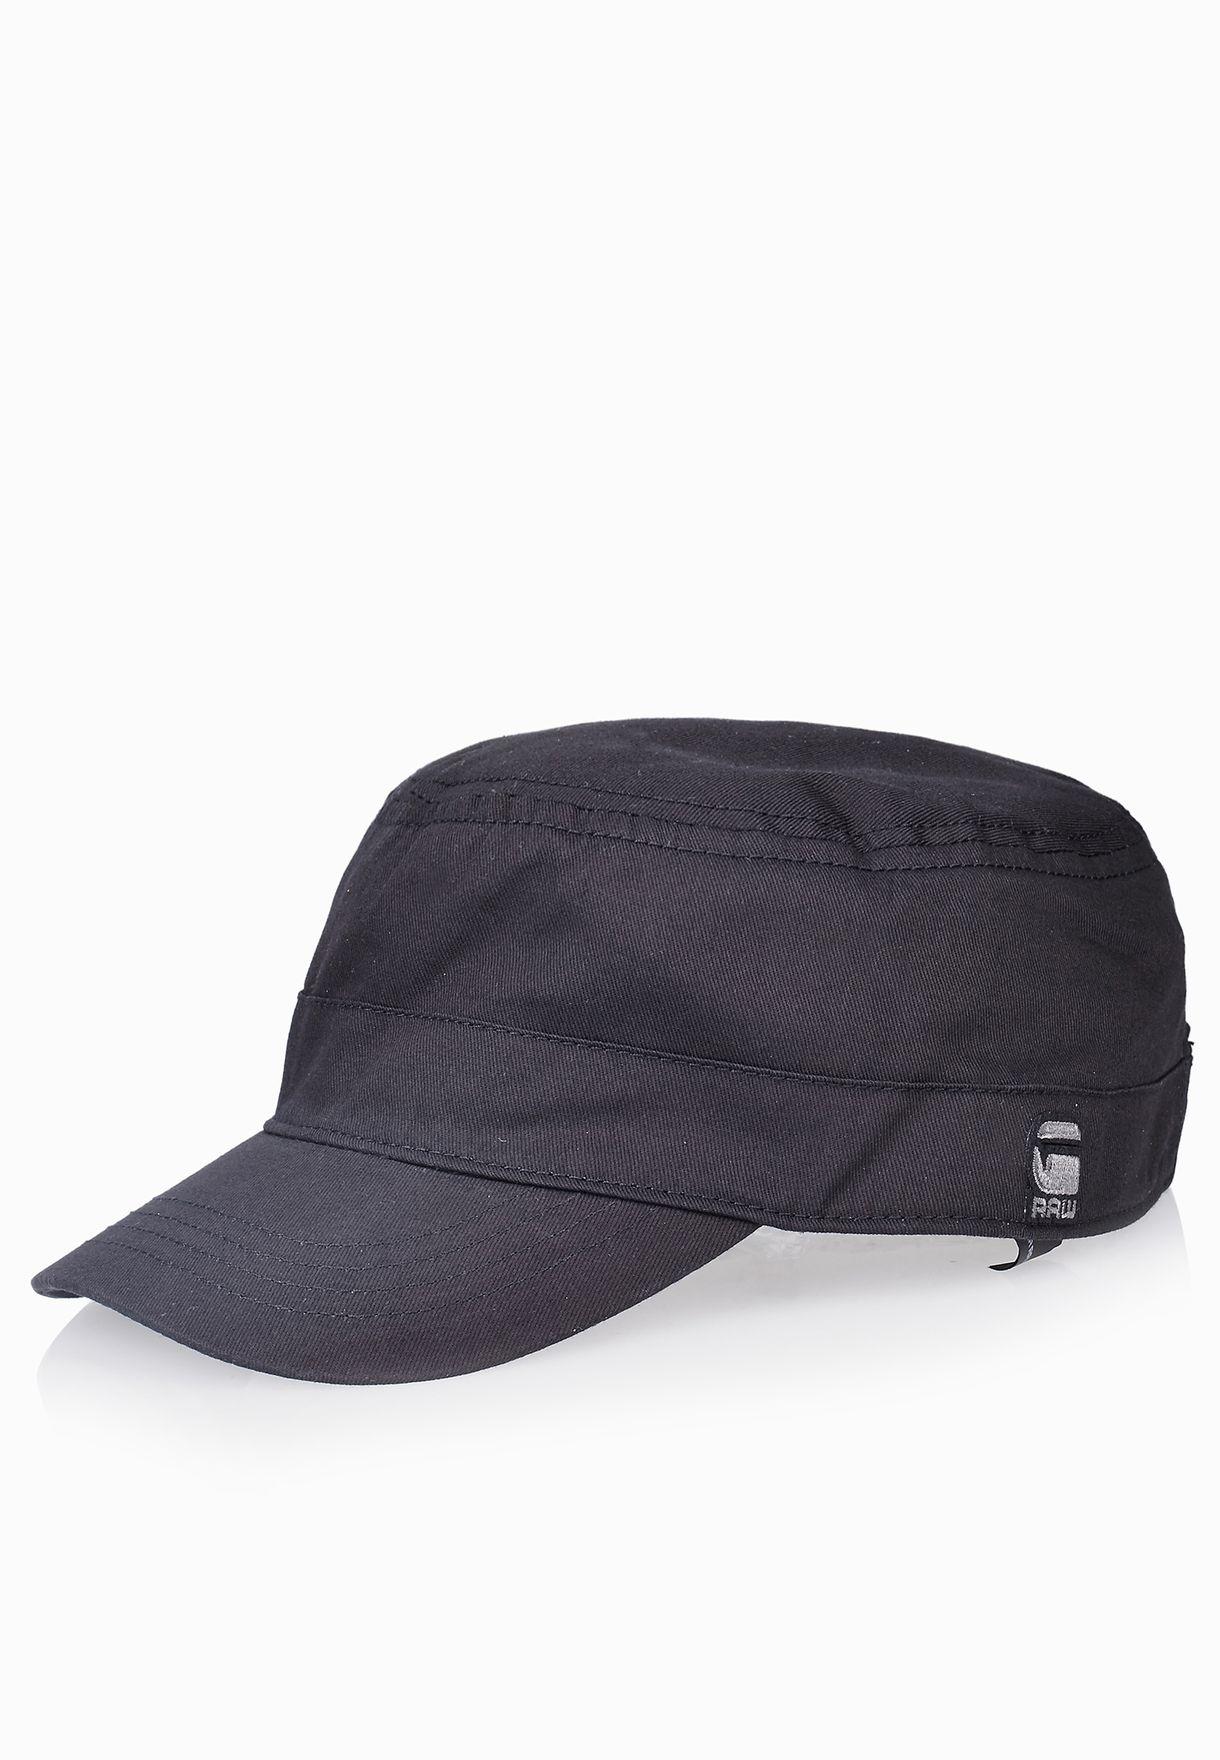 12739fb5f94 Shop G Star Raw black Coban Duty Cap 89508F for Men in Saudi - GS734AC44IEL